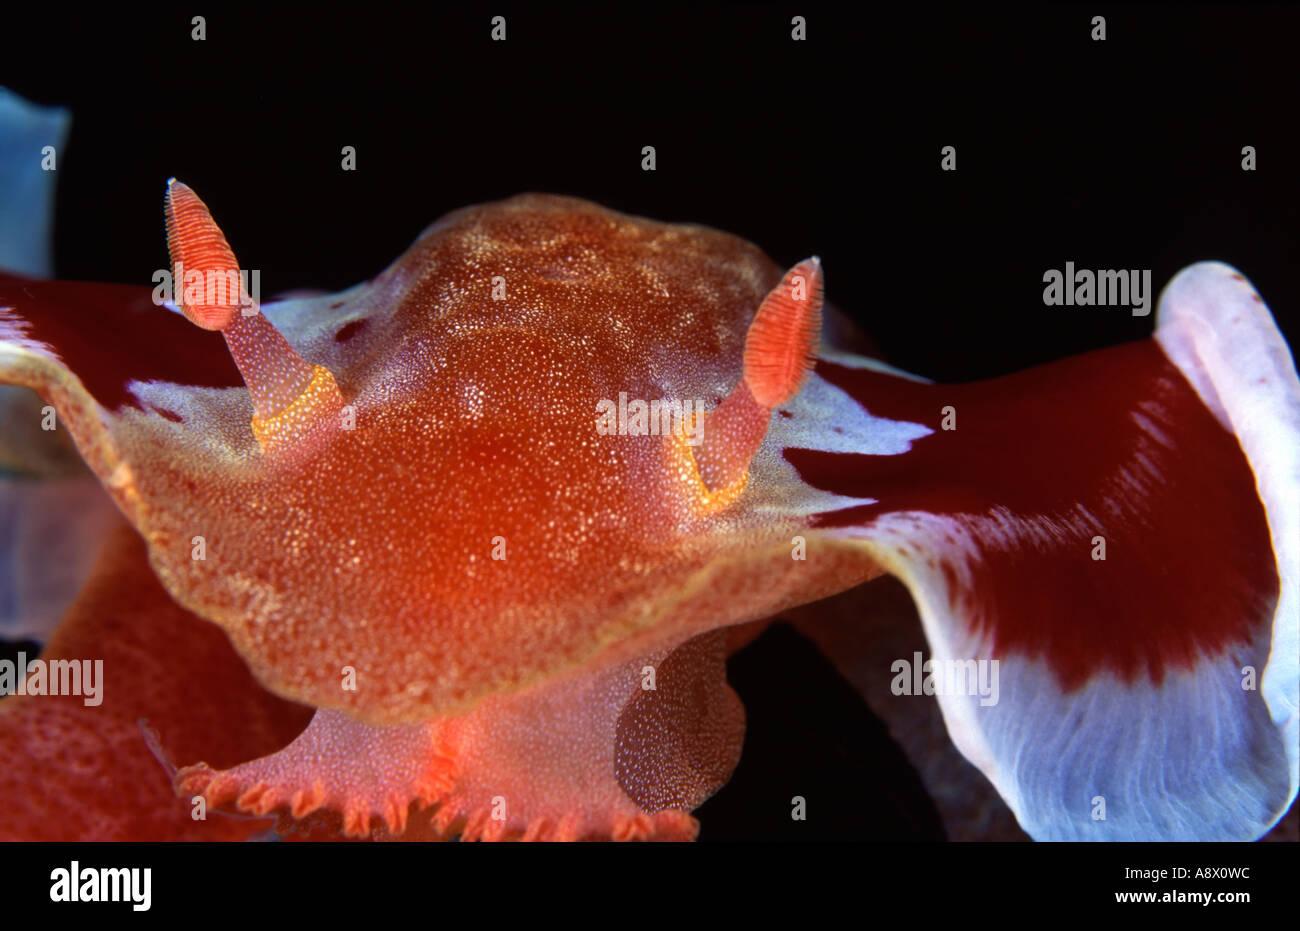 Spanish Dancer Hexabranchus sanguineus - Stock Image